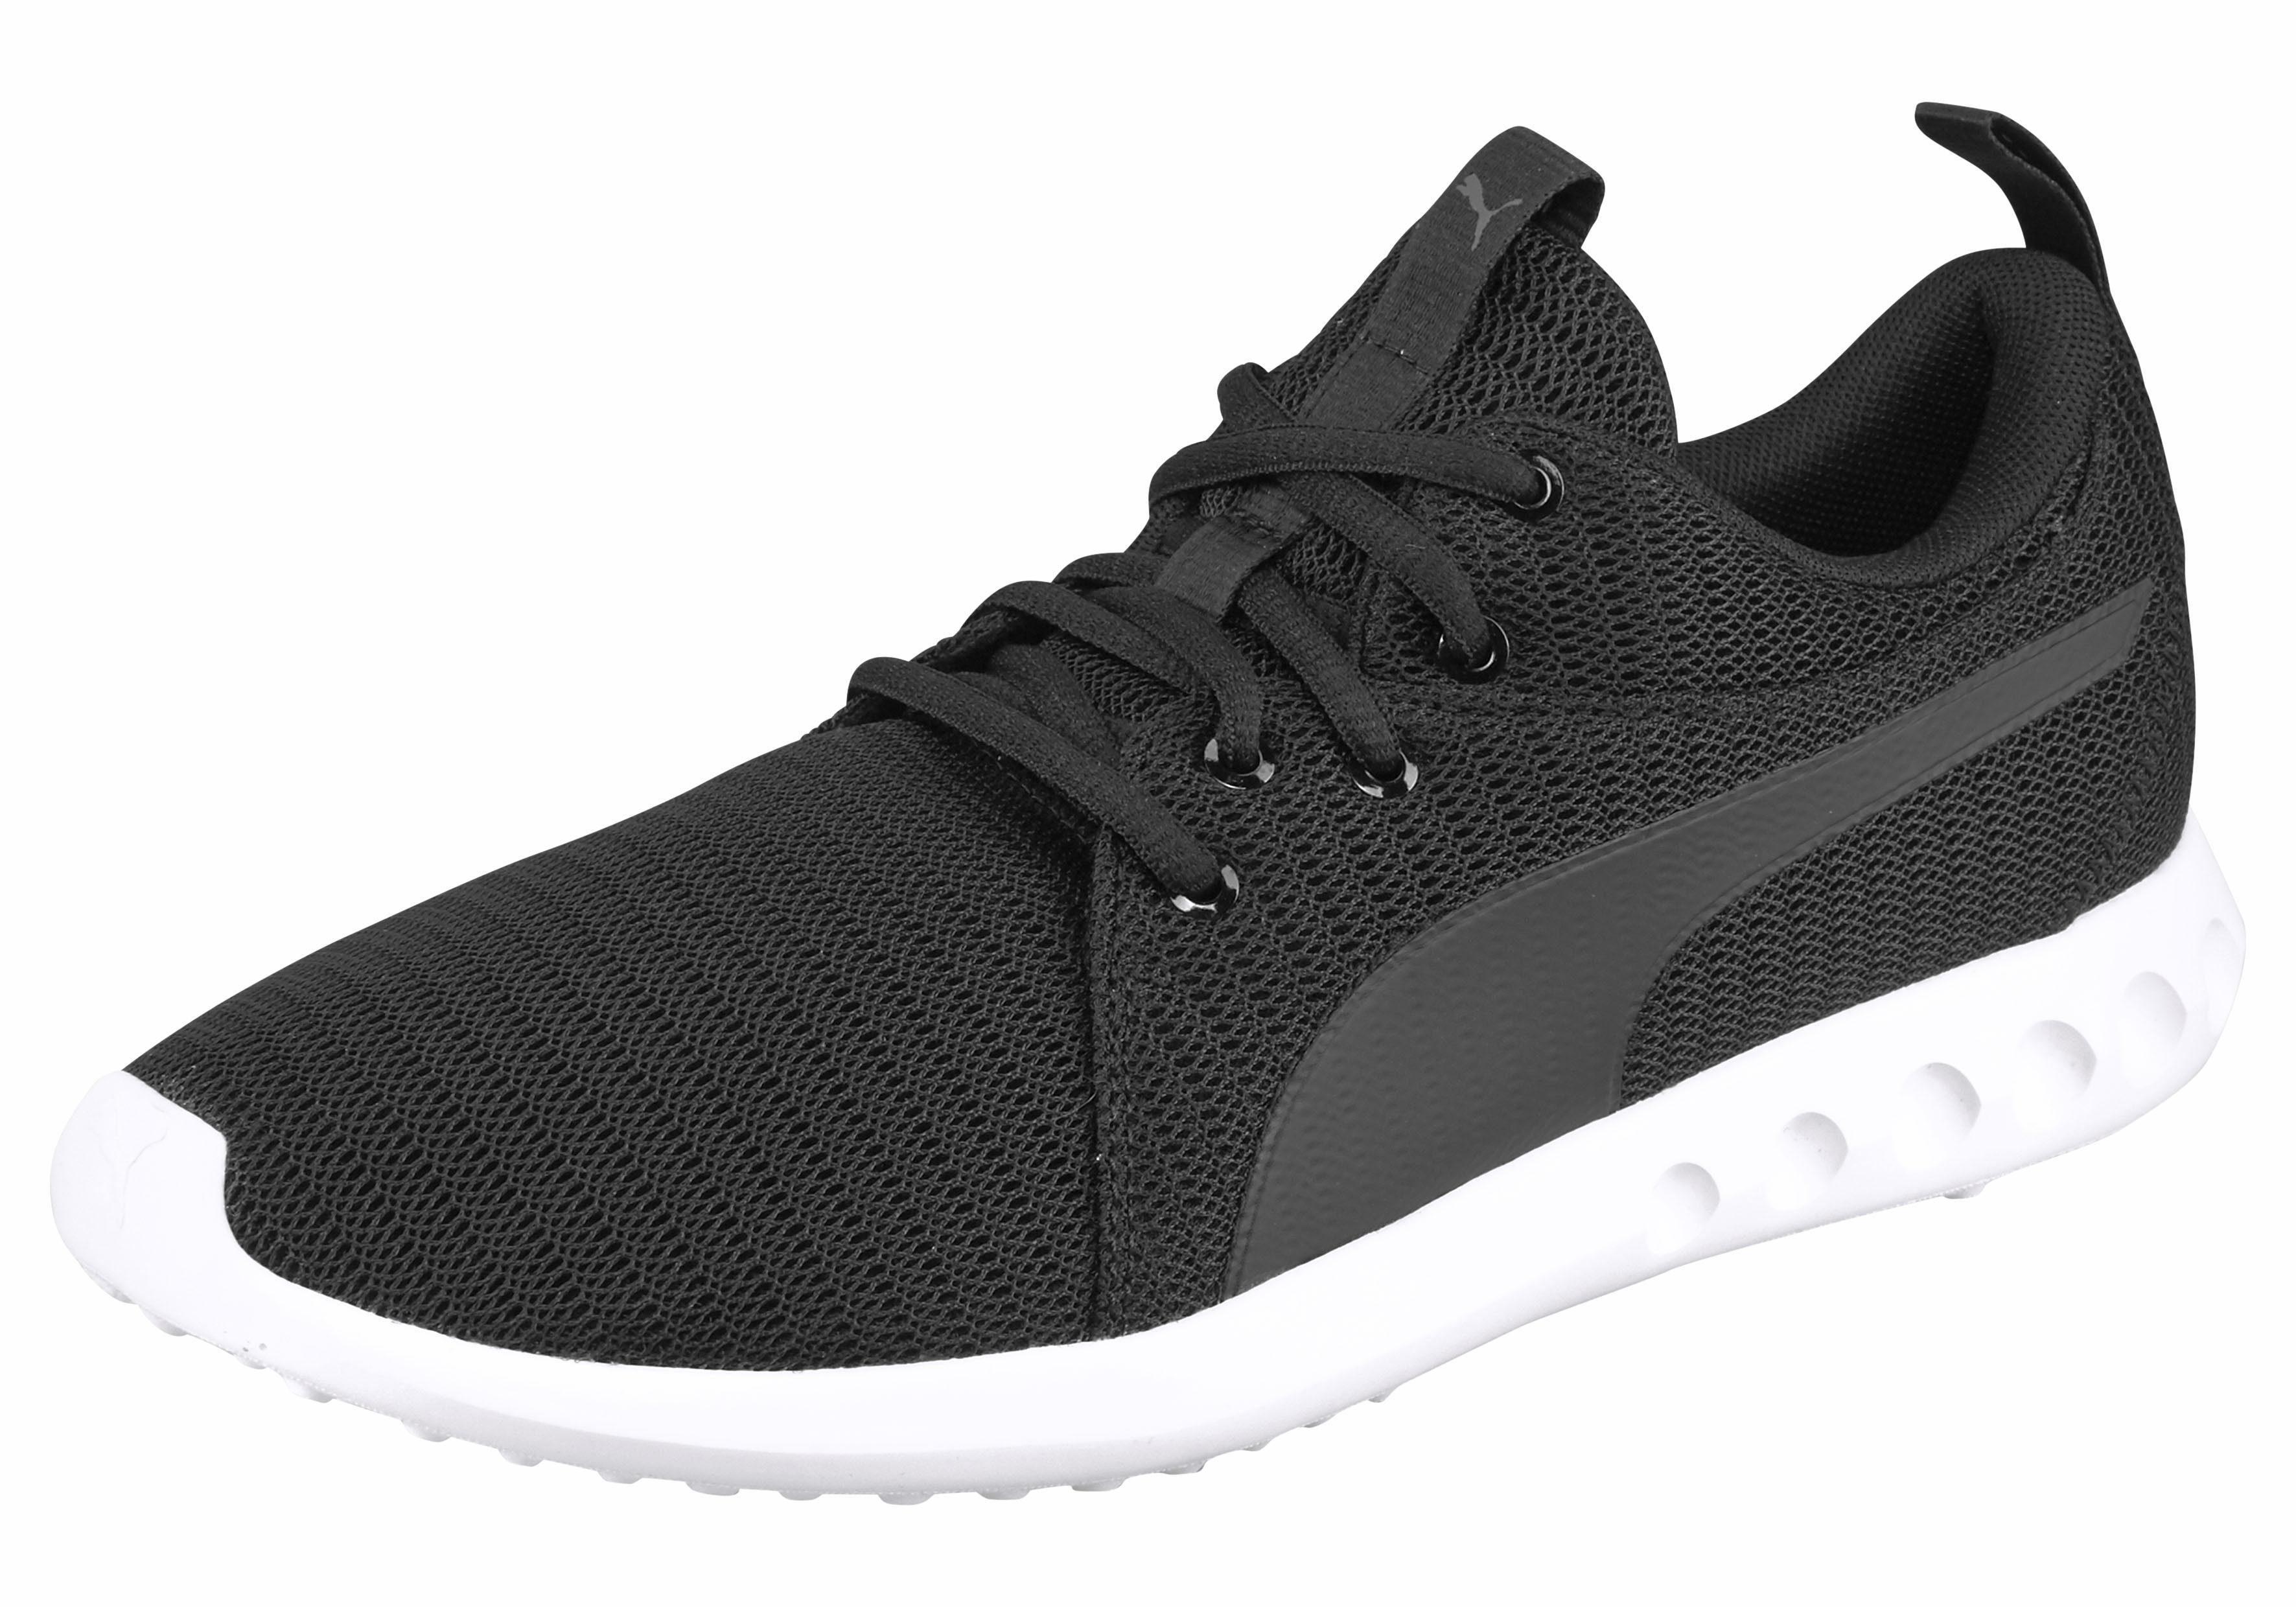 Das neue Herren Schuhe PUMA Laufschuh Carson 2 schwarz